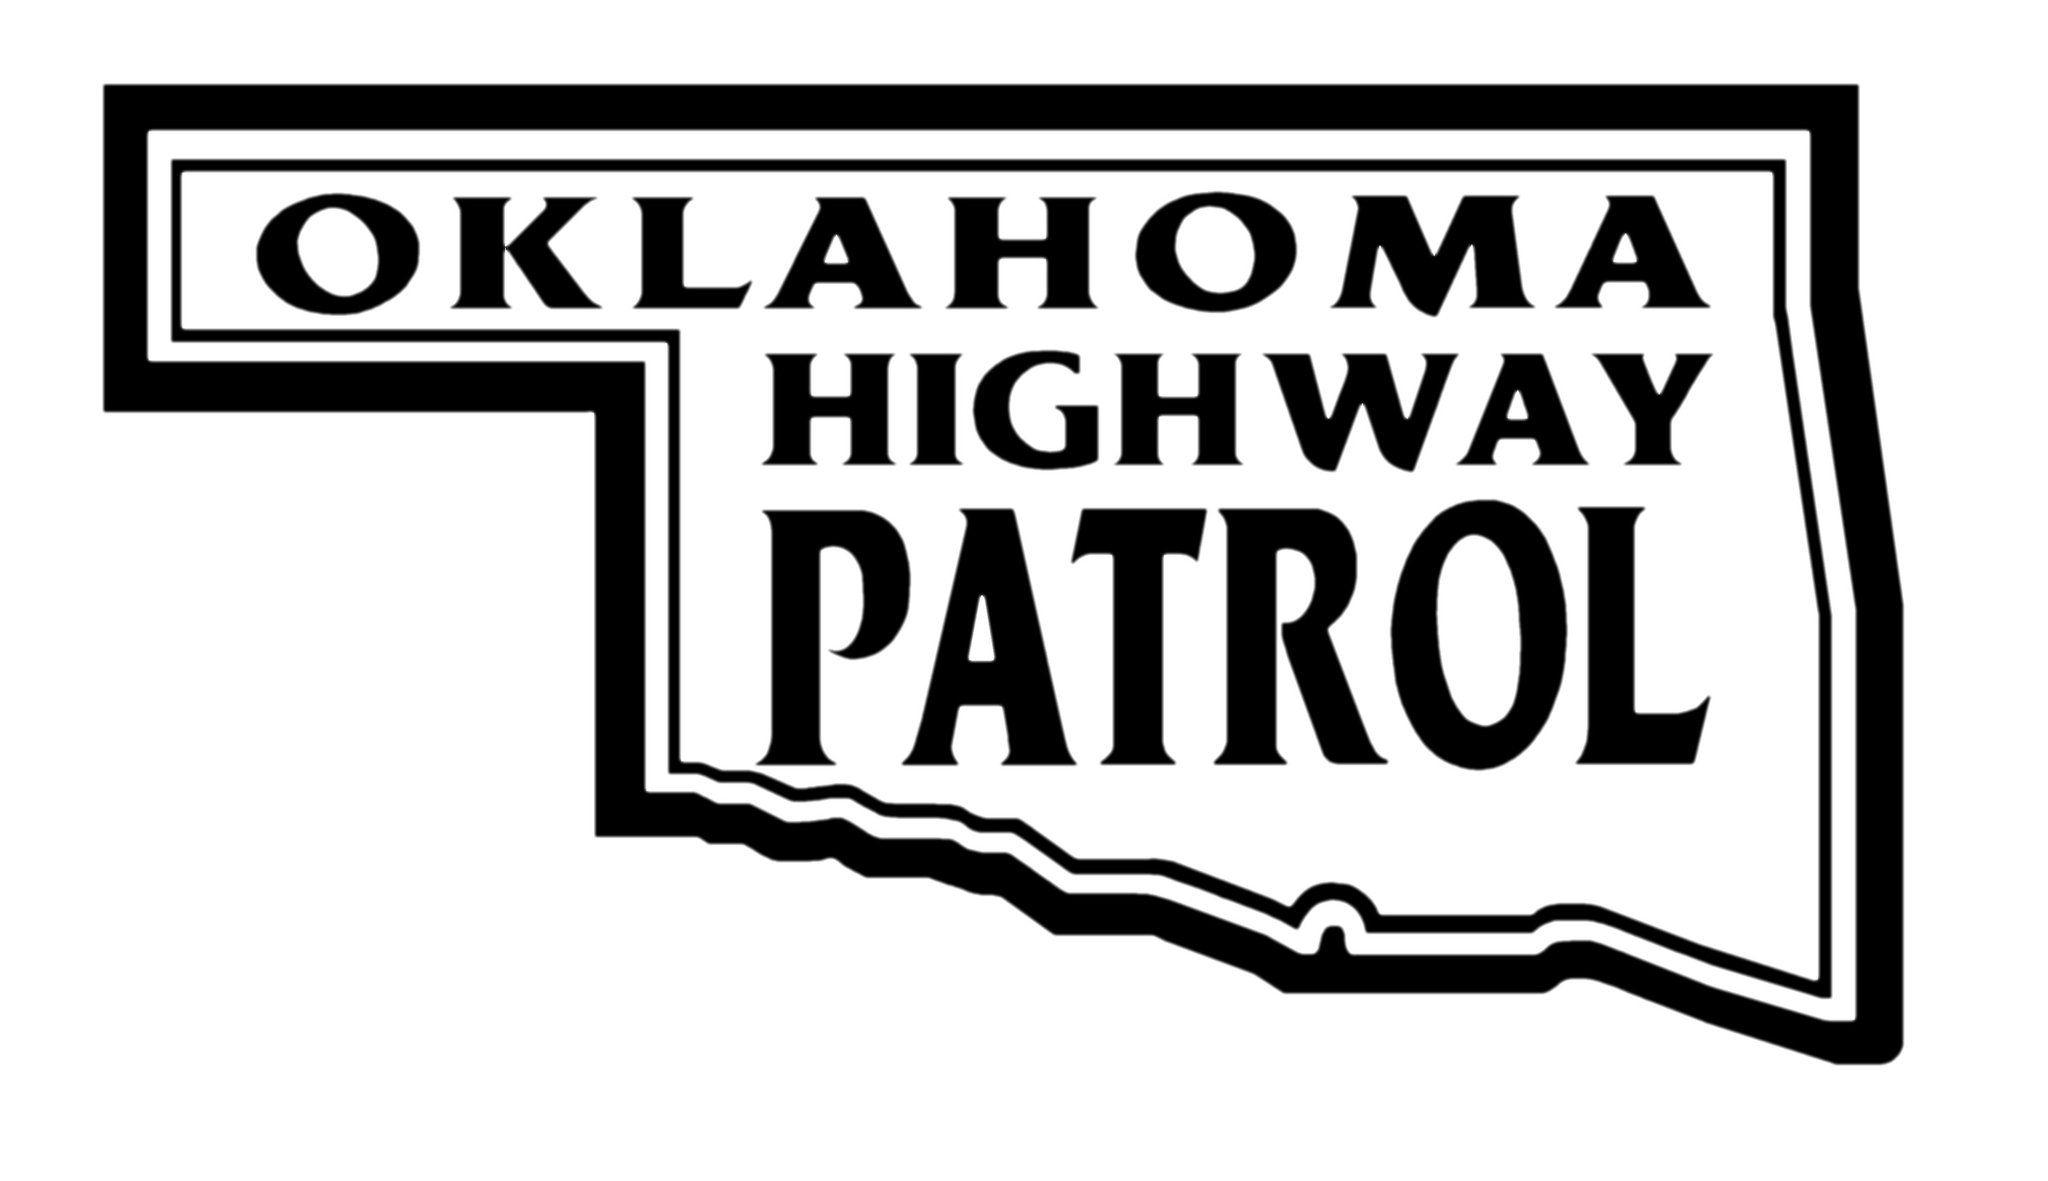 Oklahoma Highway Patrol Love It Pinterest